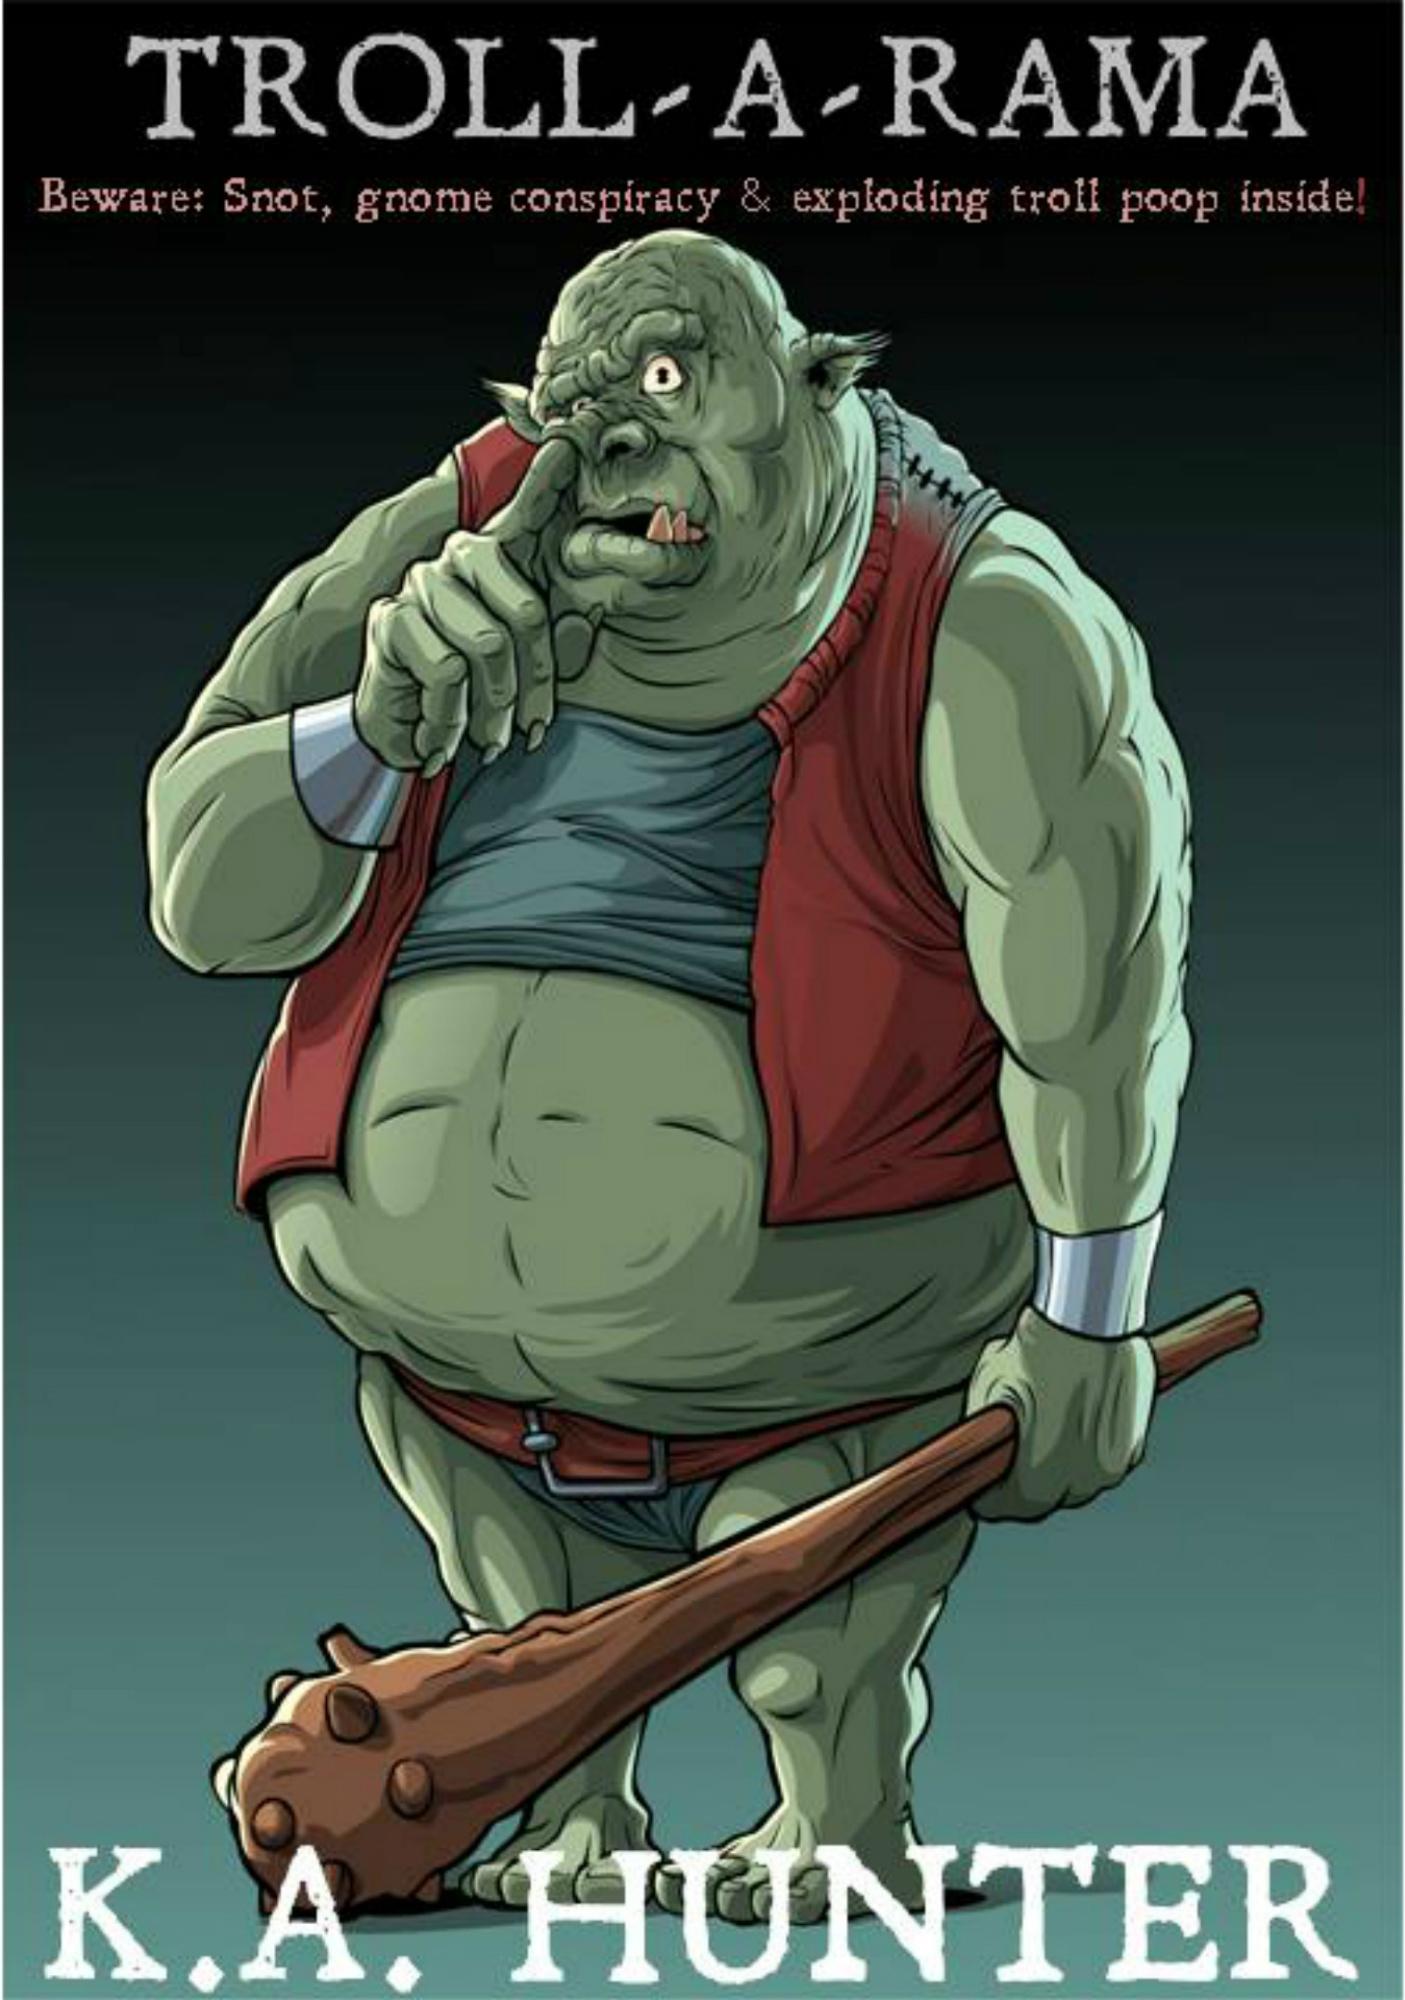 Cartoonbigdick troll erotica galleries